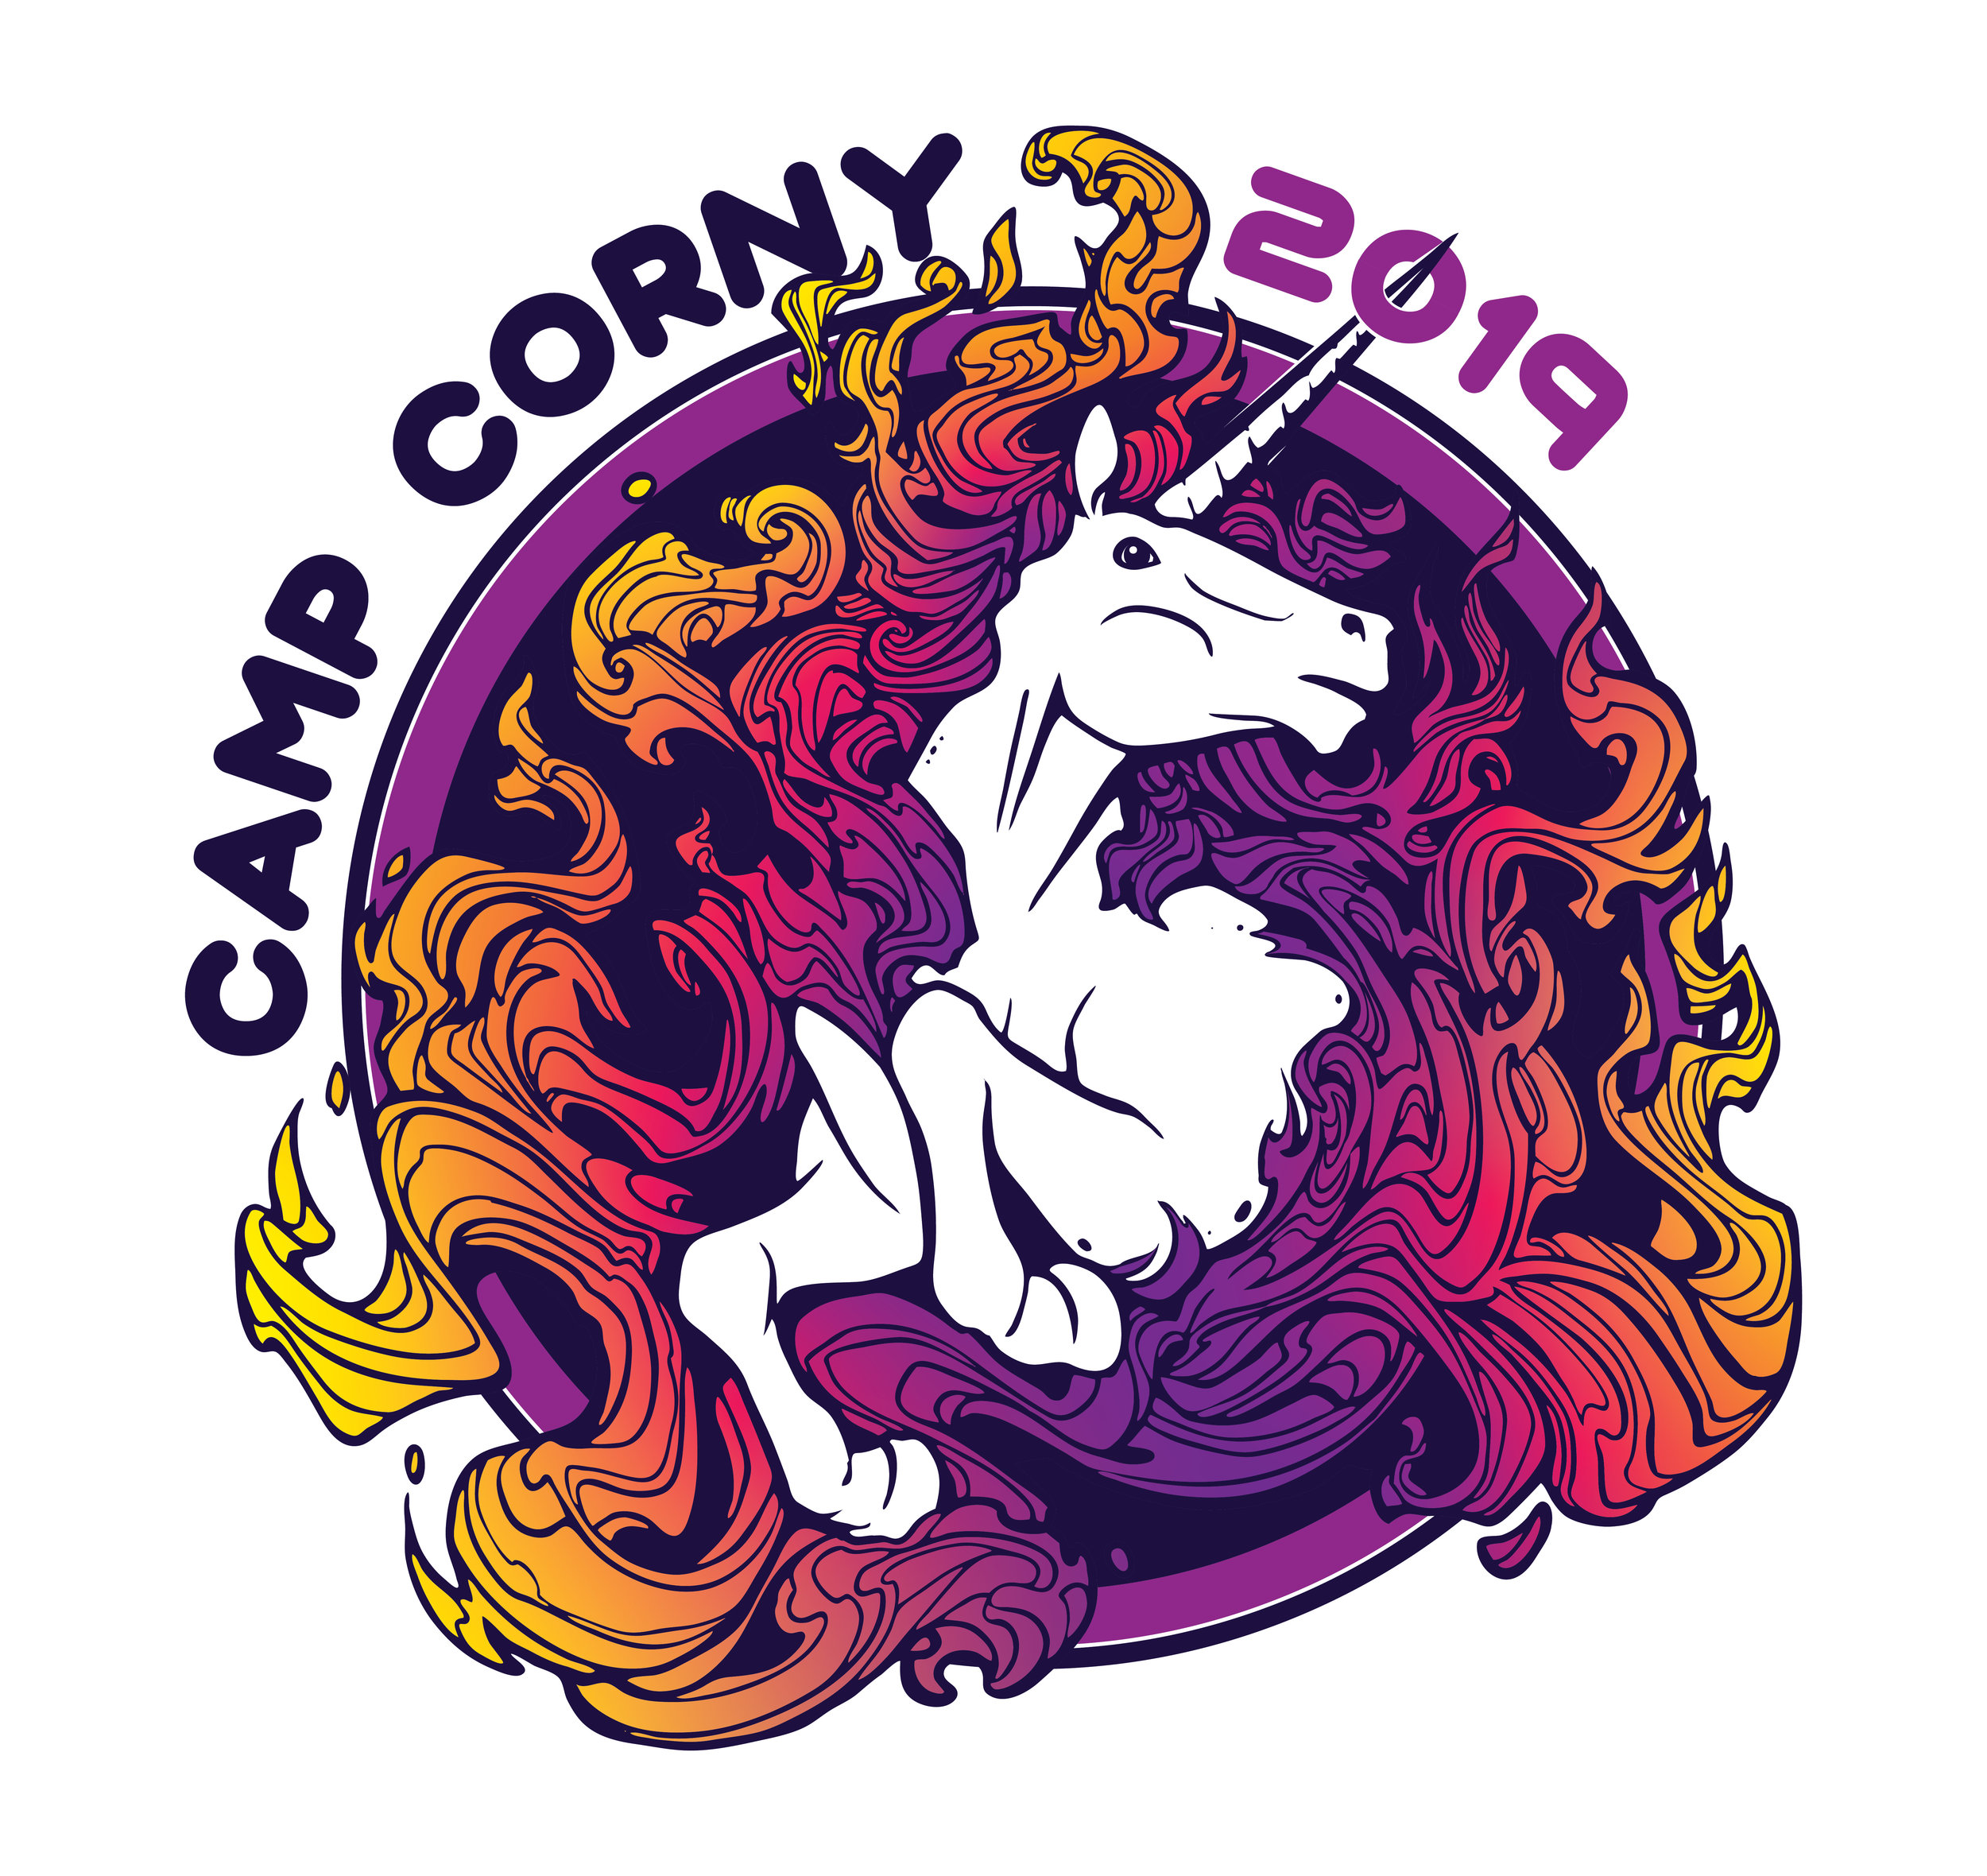 CC-2019_campcorny-2019.jpg